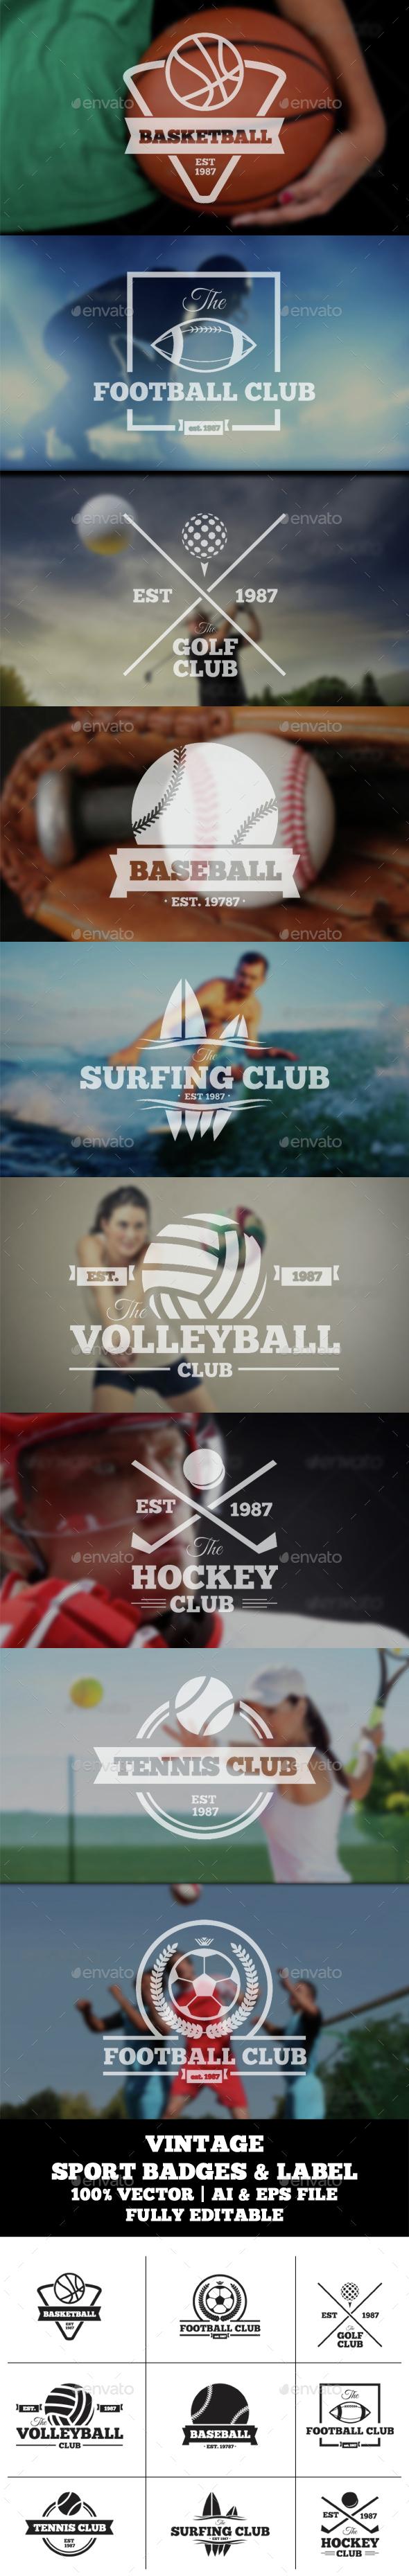 Vintage Sports Badge & Label - Badges & Stickers Web Elements